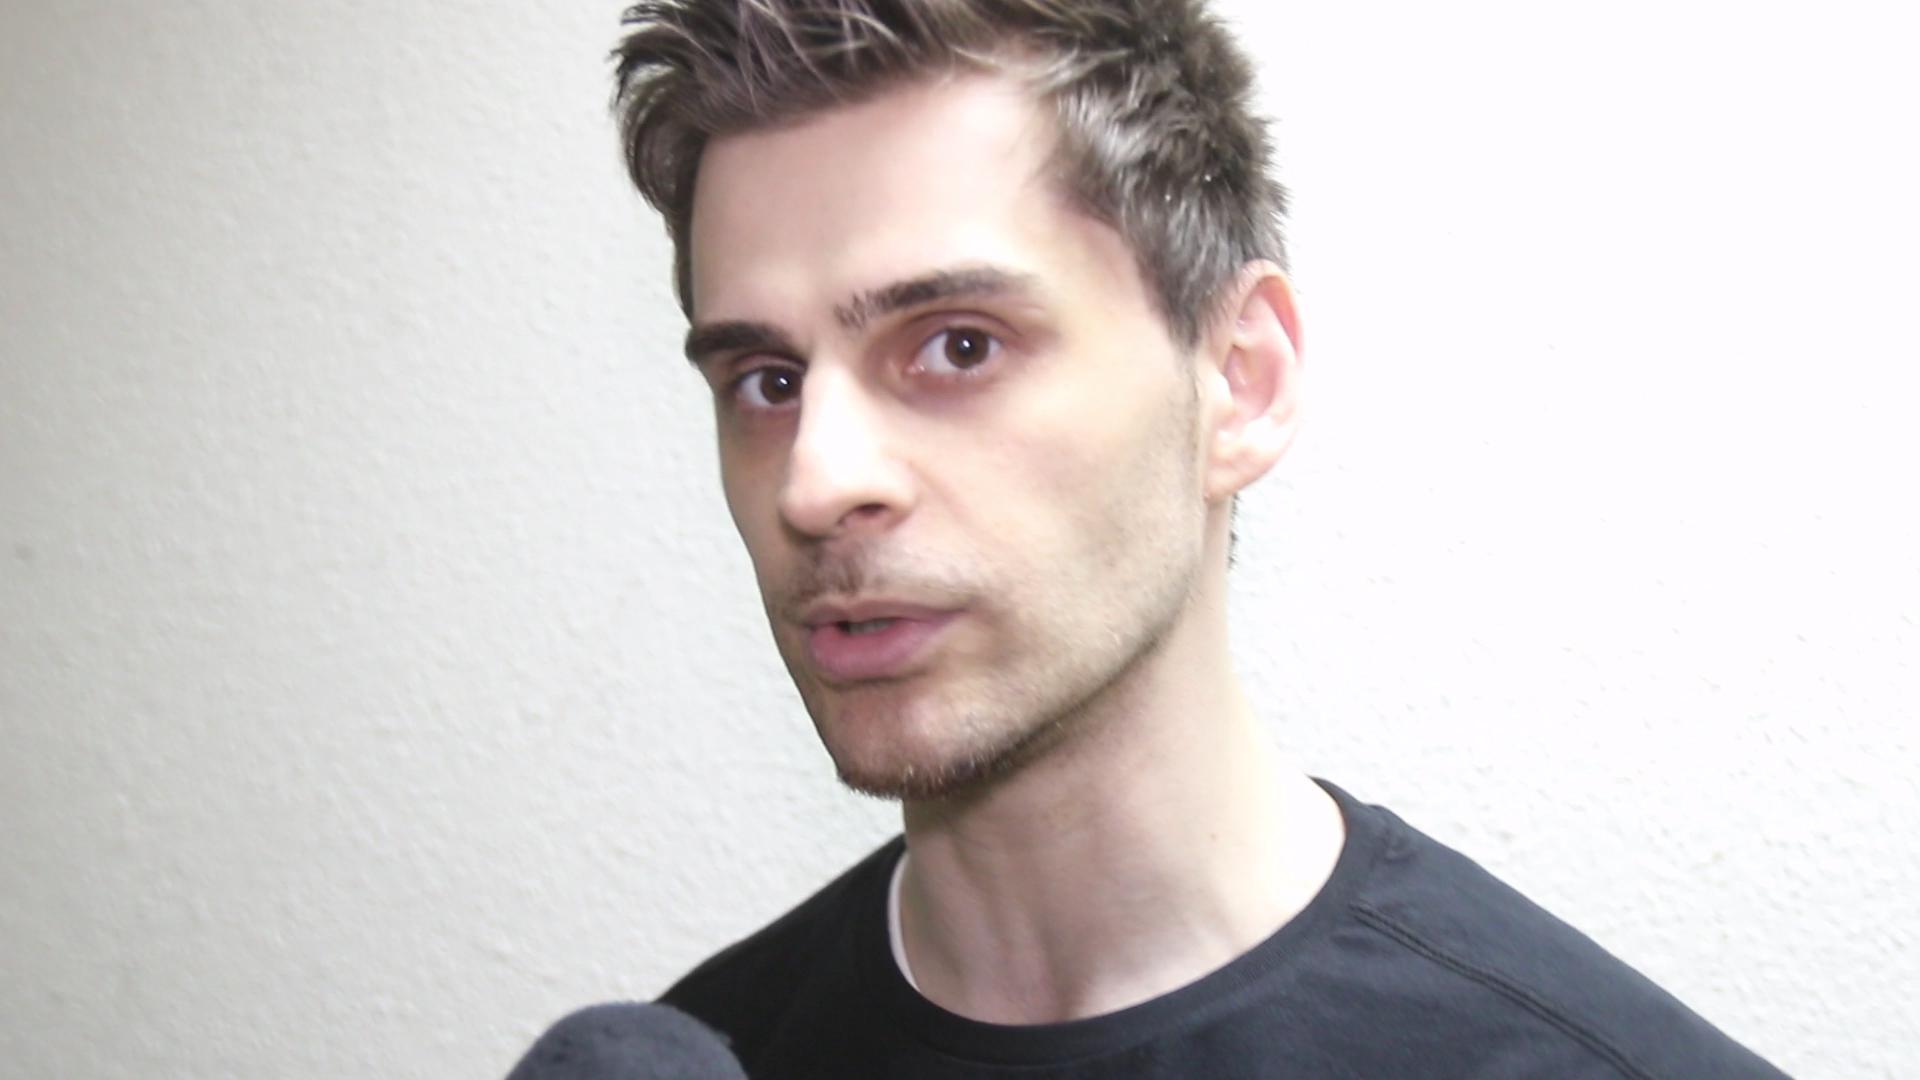 Robo a stat de vorba cu reporterul CANCAN.ro